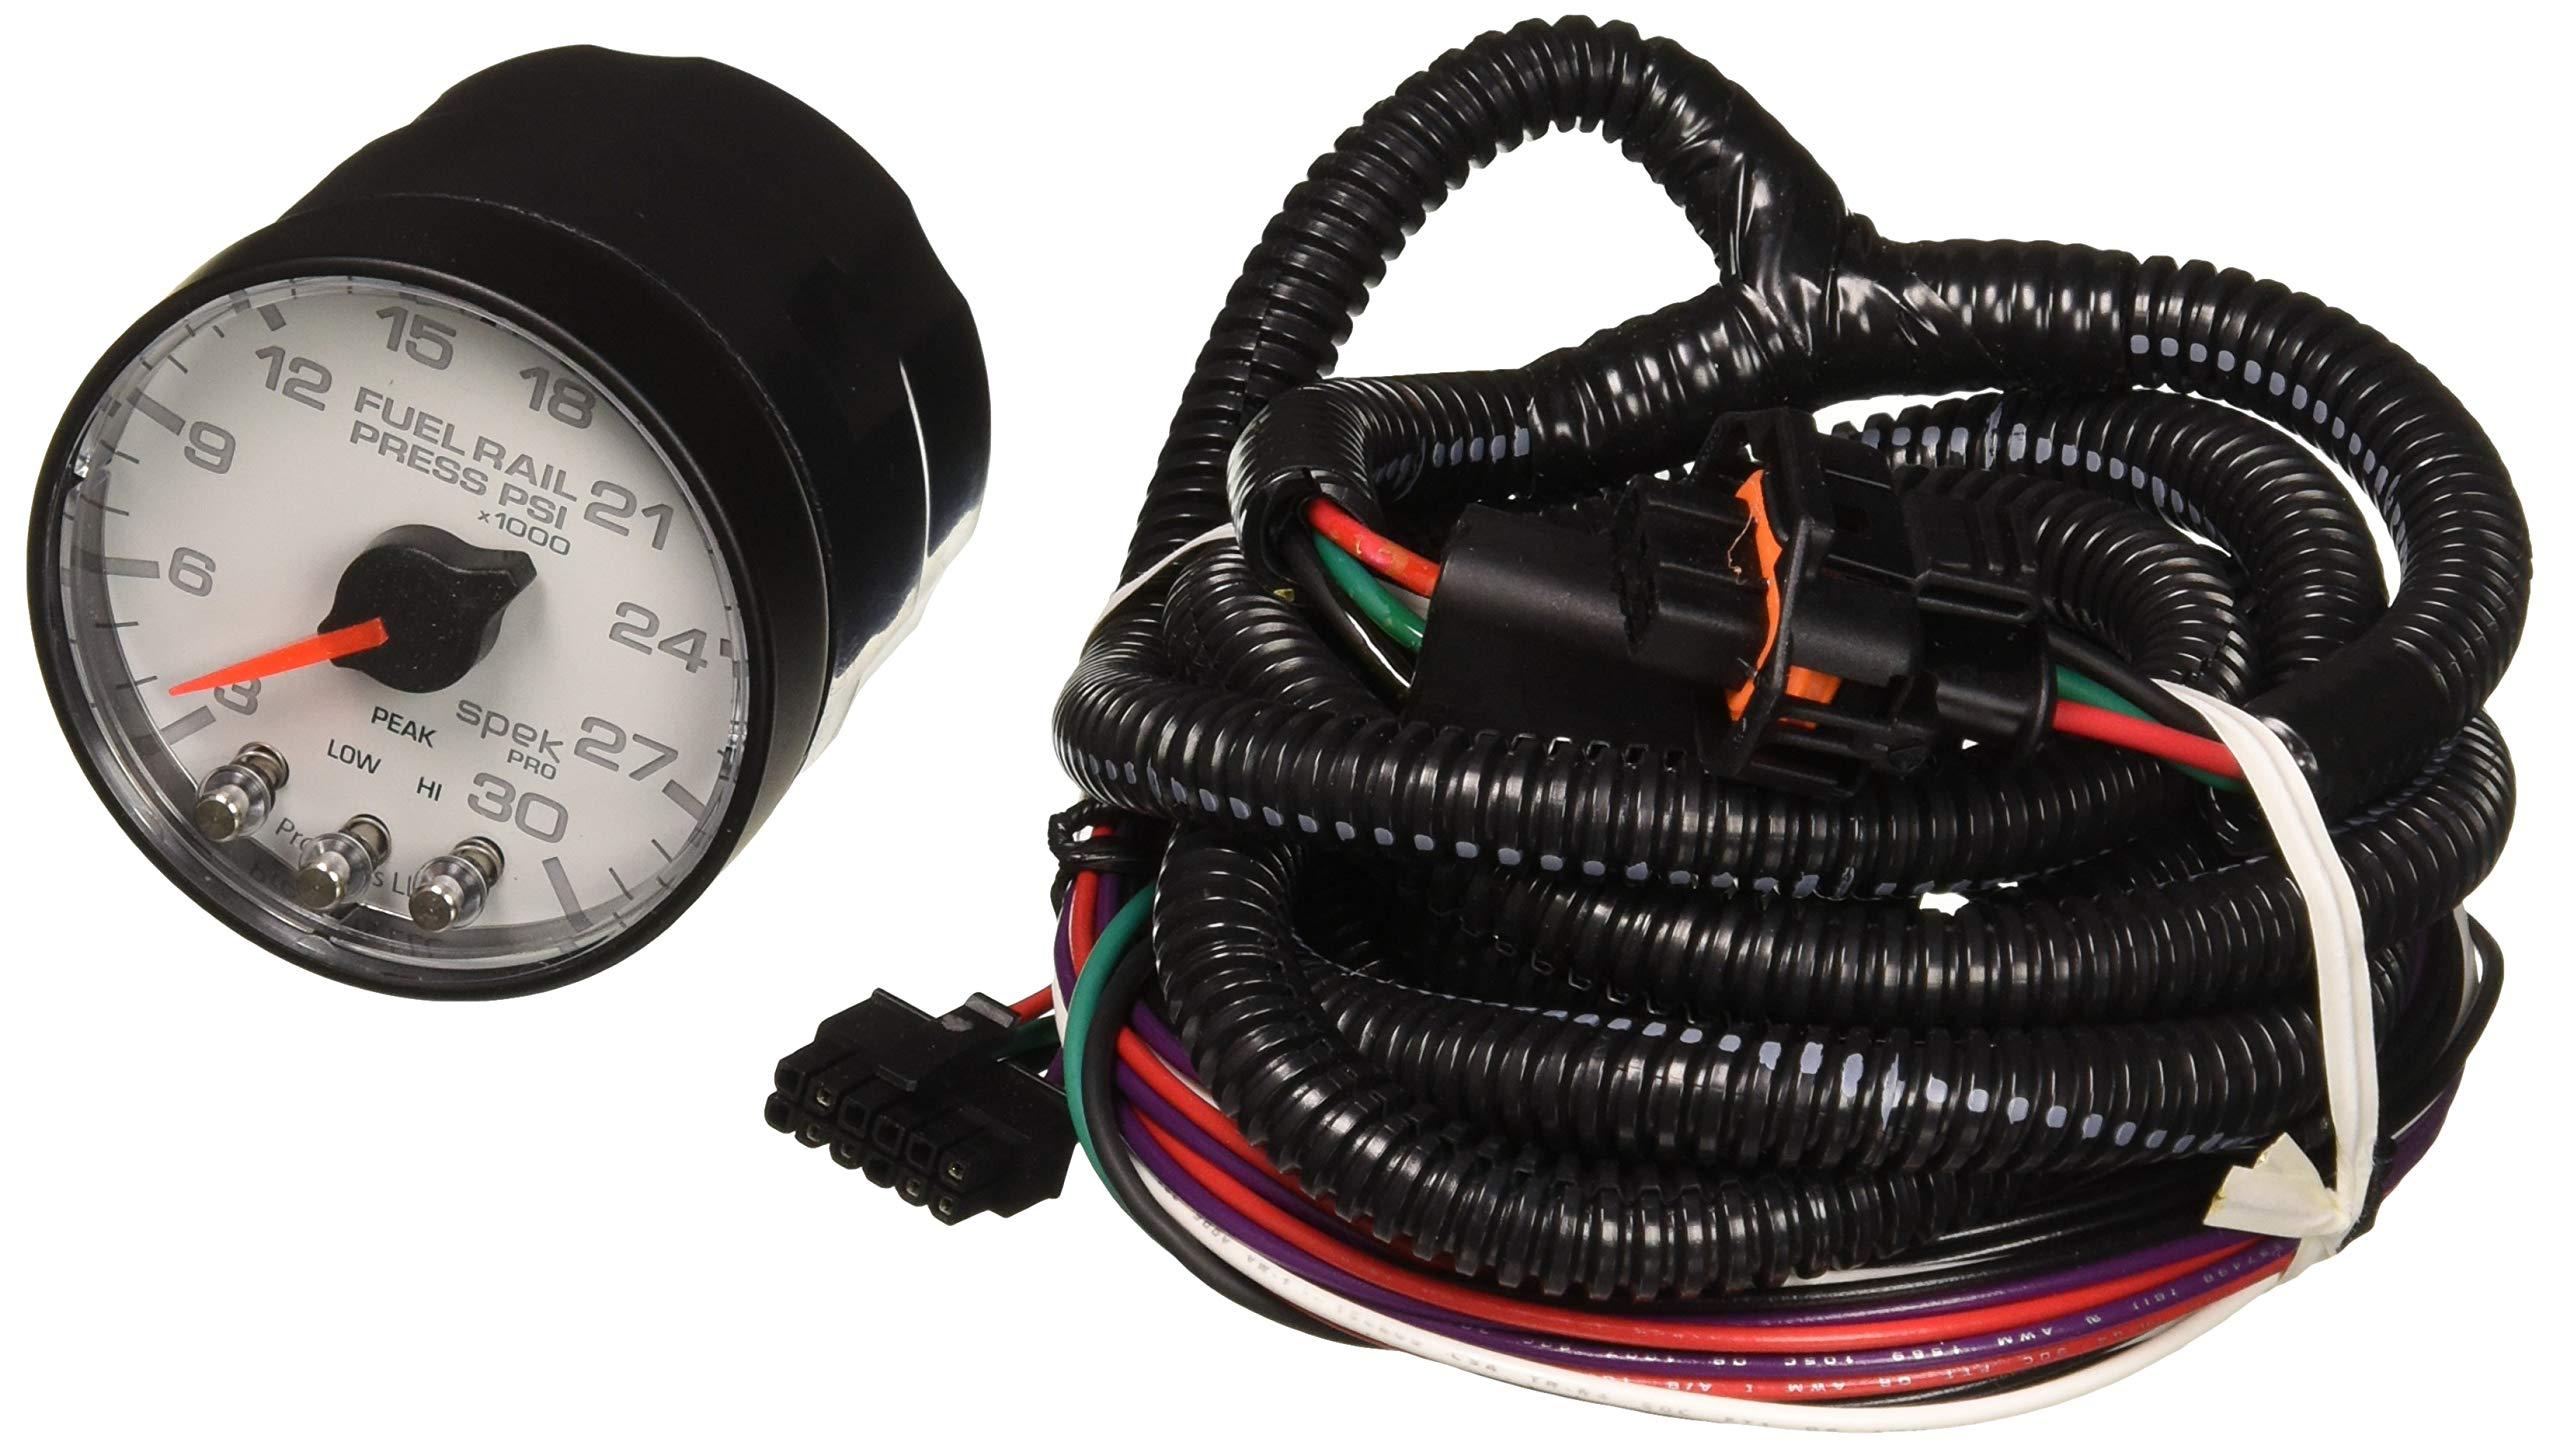 Auto Meter AutoMeter P321128 Gauge, Rail Press, 2 1/16'', 30Kpsi, Stepper Motor W/Peak & Warn, Wht/Blk, Spek-Pro